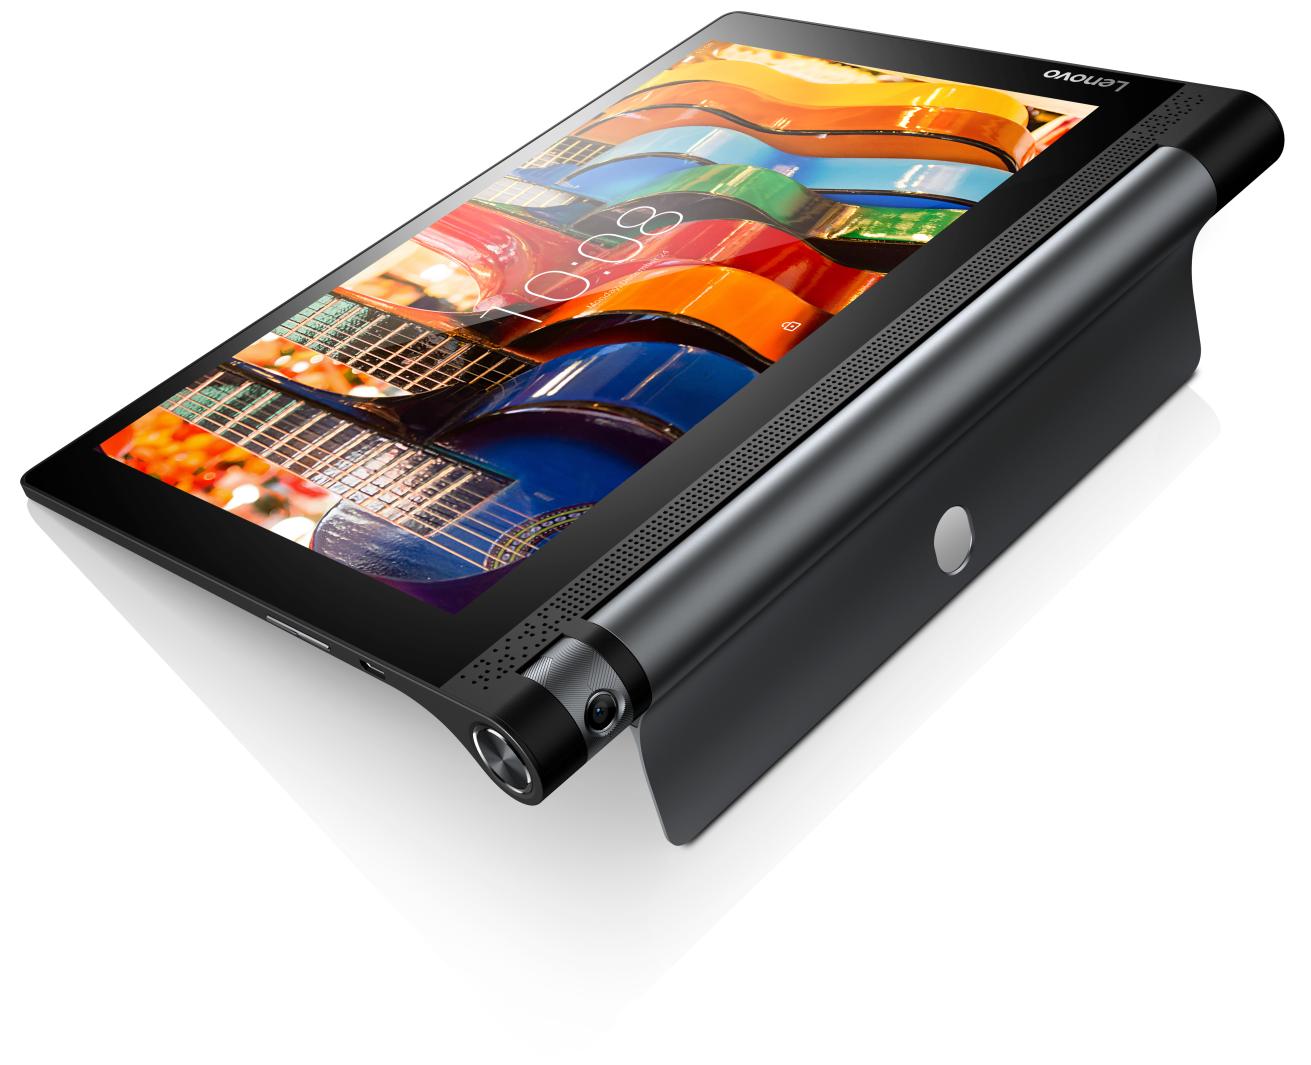 "Lenovo Yoga TAB 3 10"" LTE/Qualcomm1,30GHz/2GB/16GB/10,1"" IPS/1280x800/8M Foto/ANYPEN/Android 5.1 černá ZA0K0036CZ"